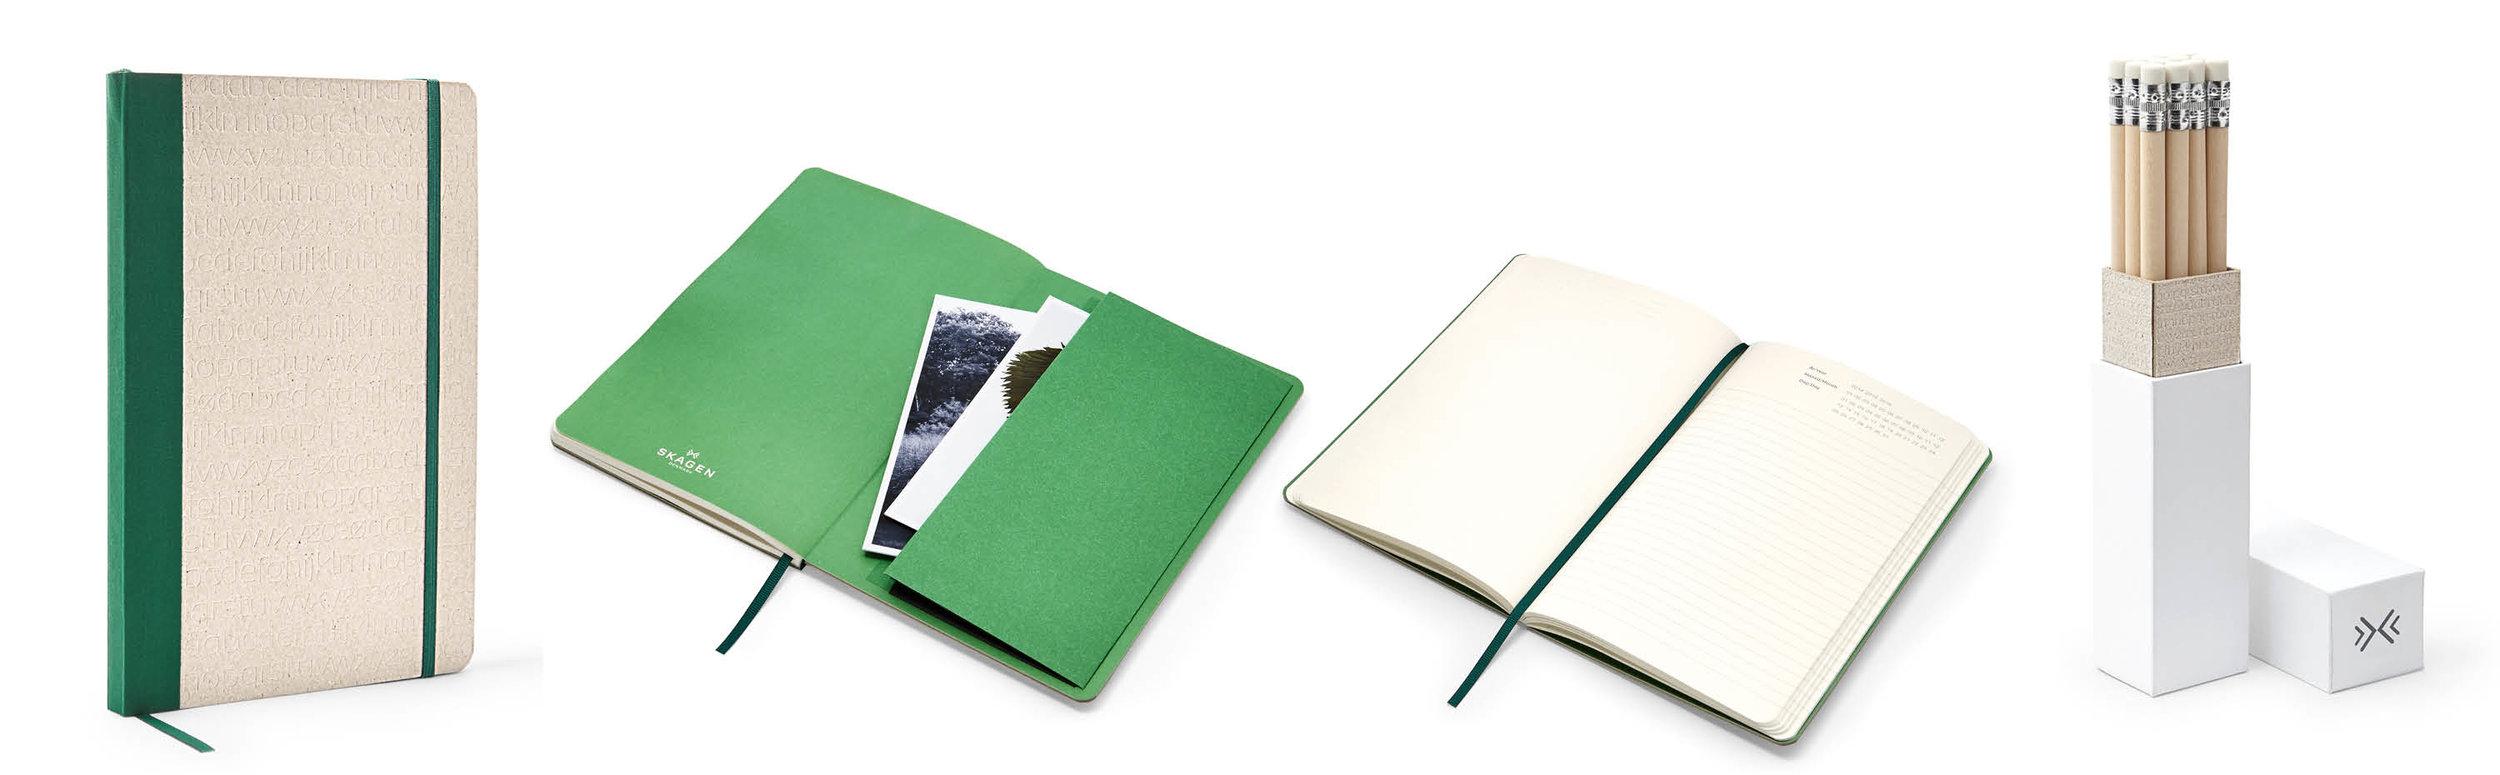 ProductDesign-StationeryGifts-022.jpg